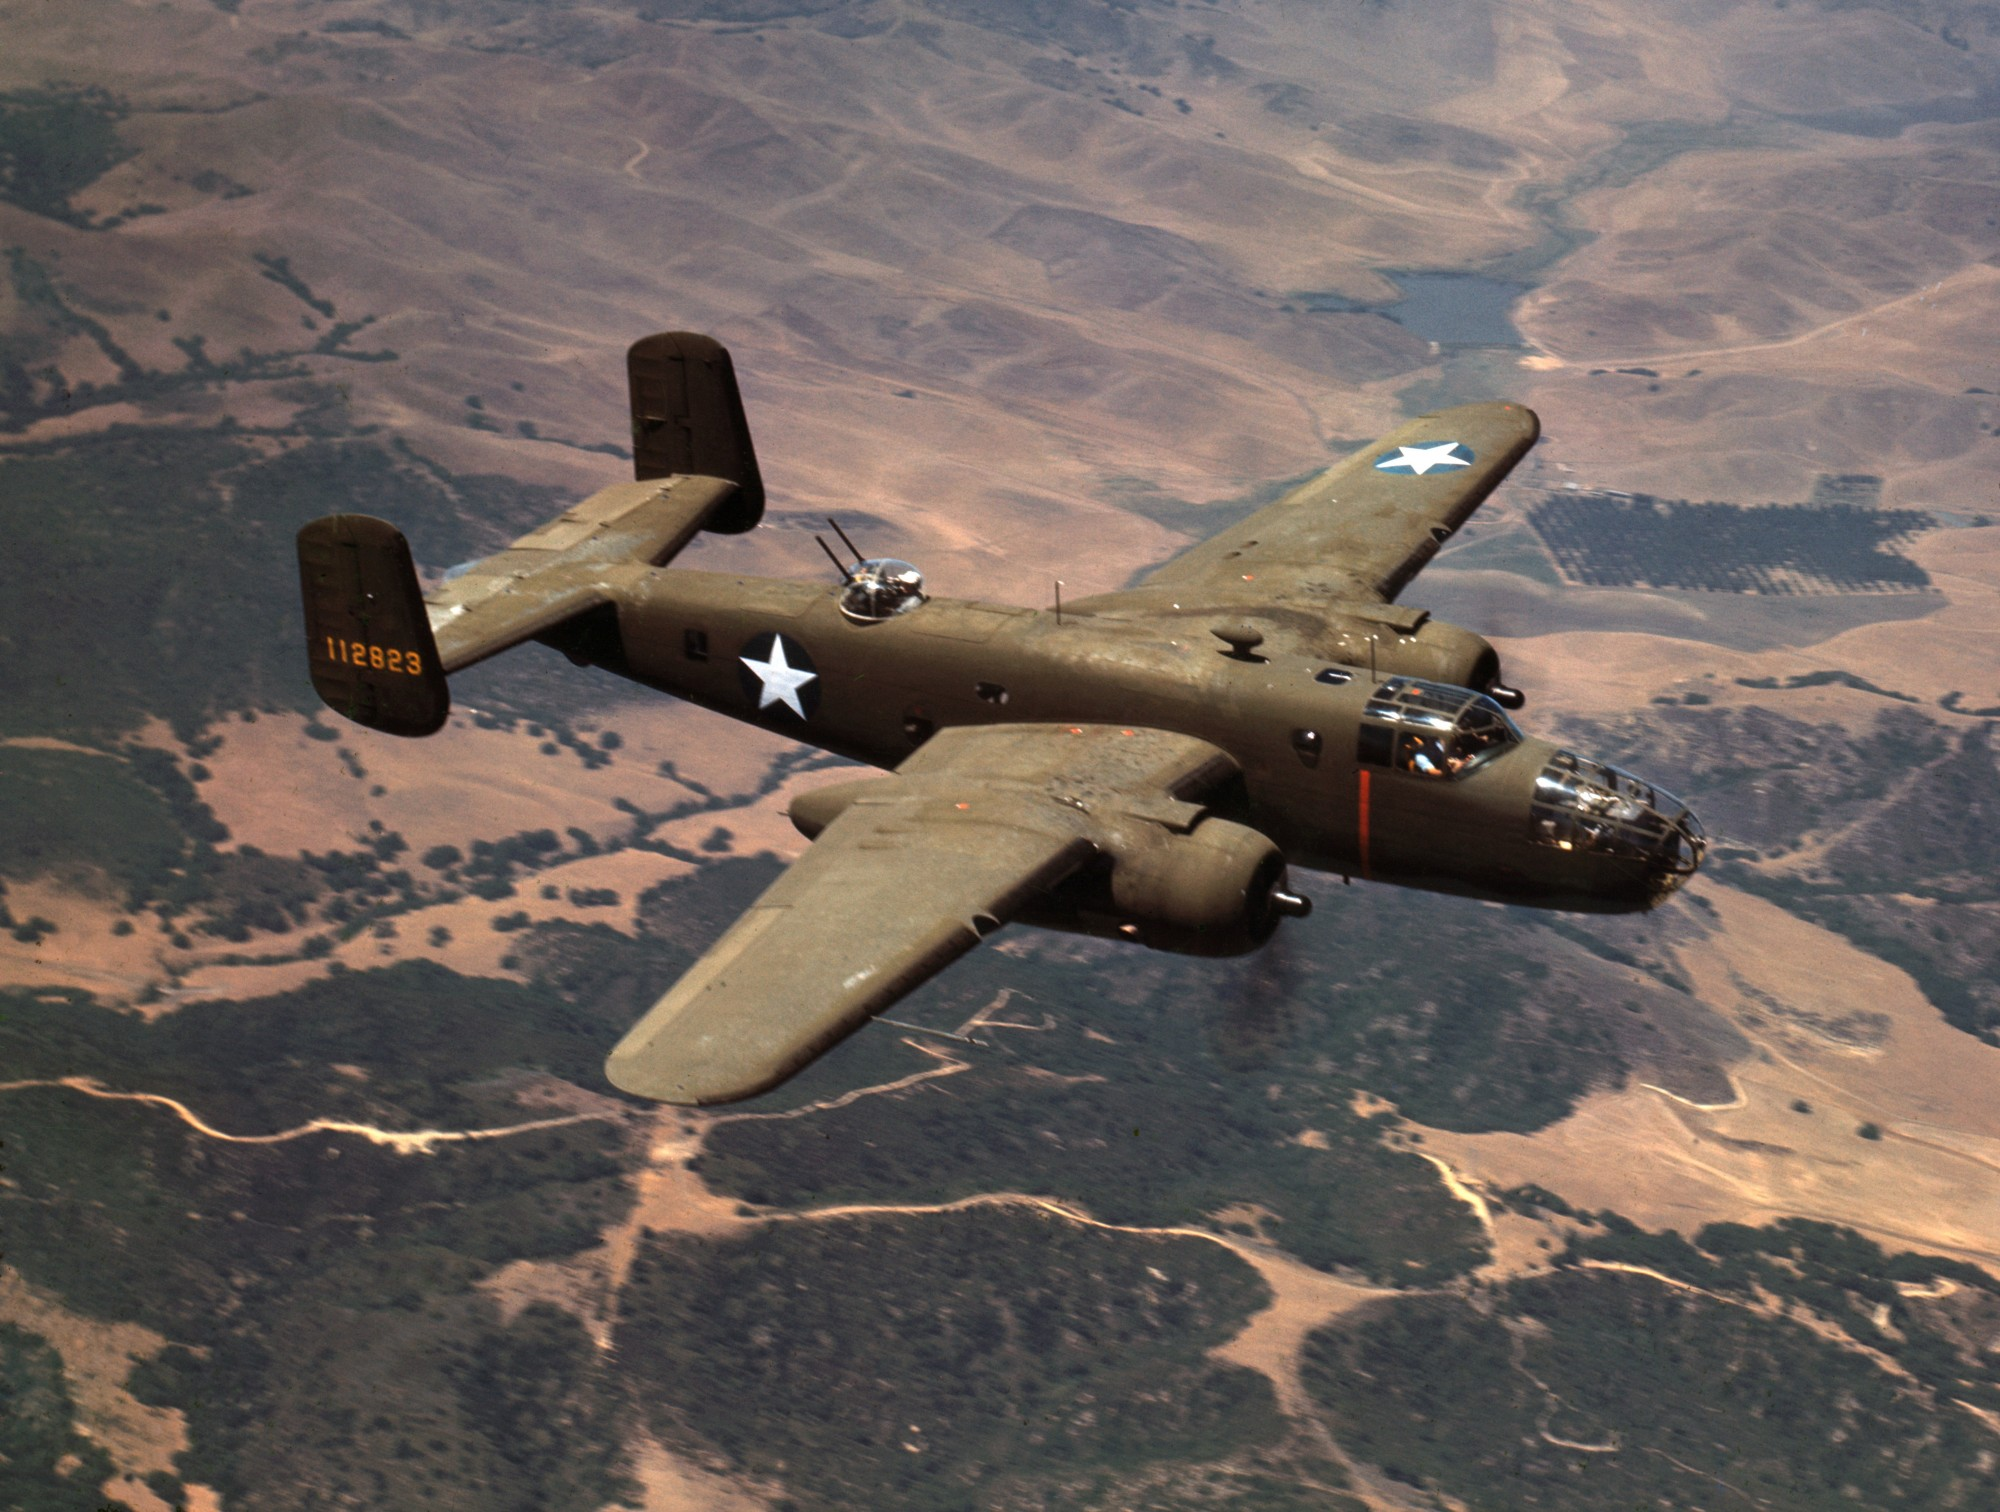 U.S. Army Air Force North American B-25C Mitchell – бомбардировачът в полет над Ингълууд Калифорния (САЩ)